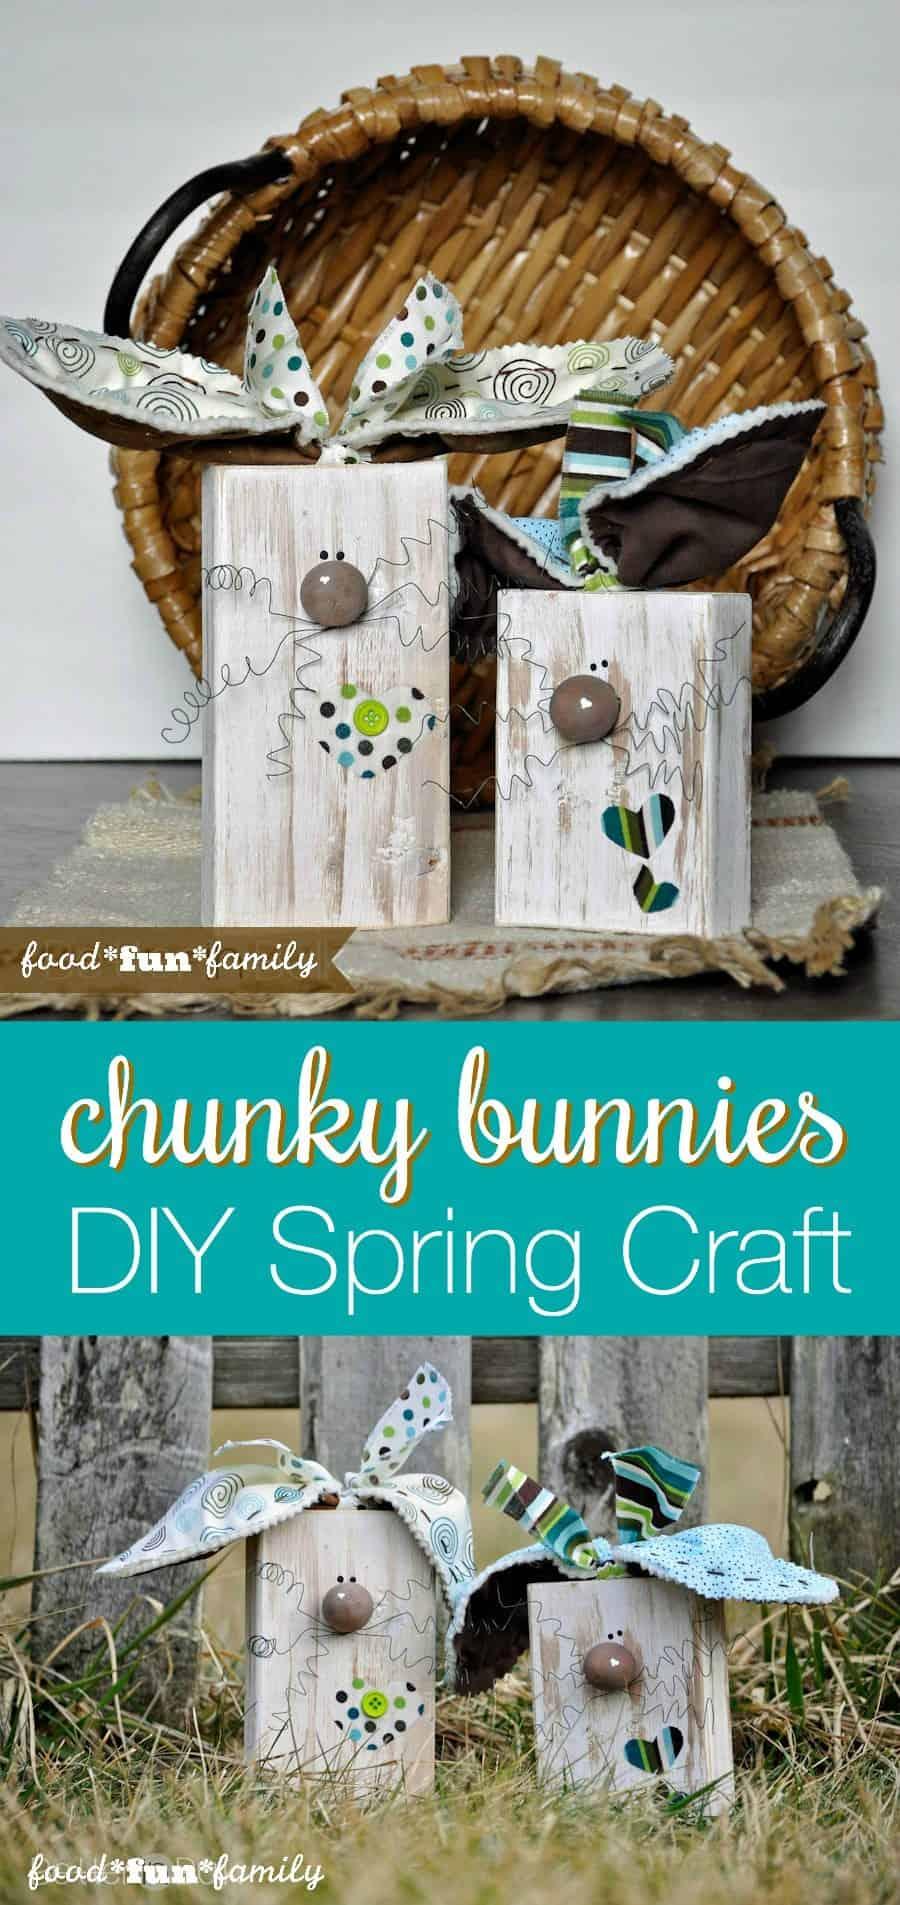 Wooden chunky bunnies